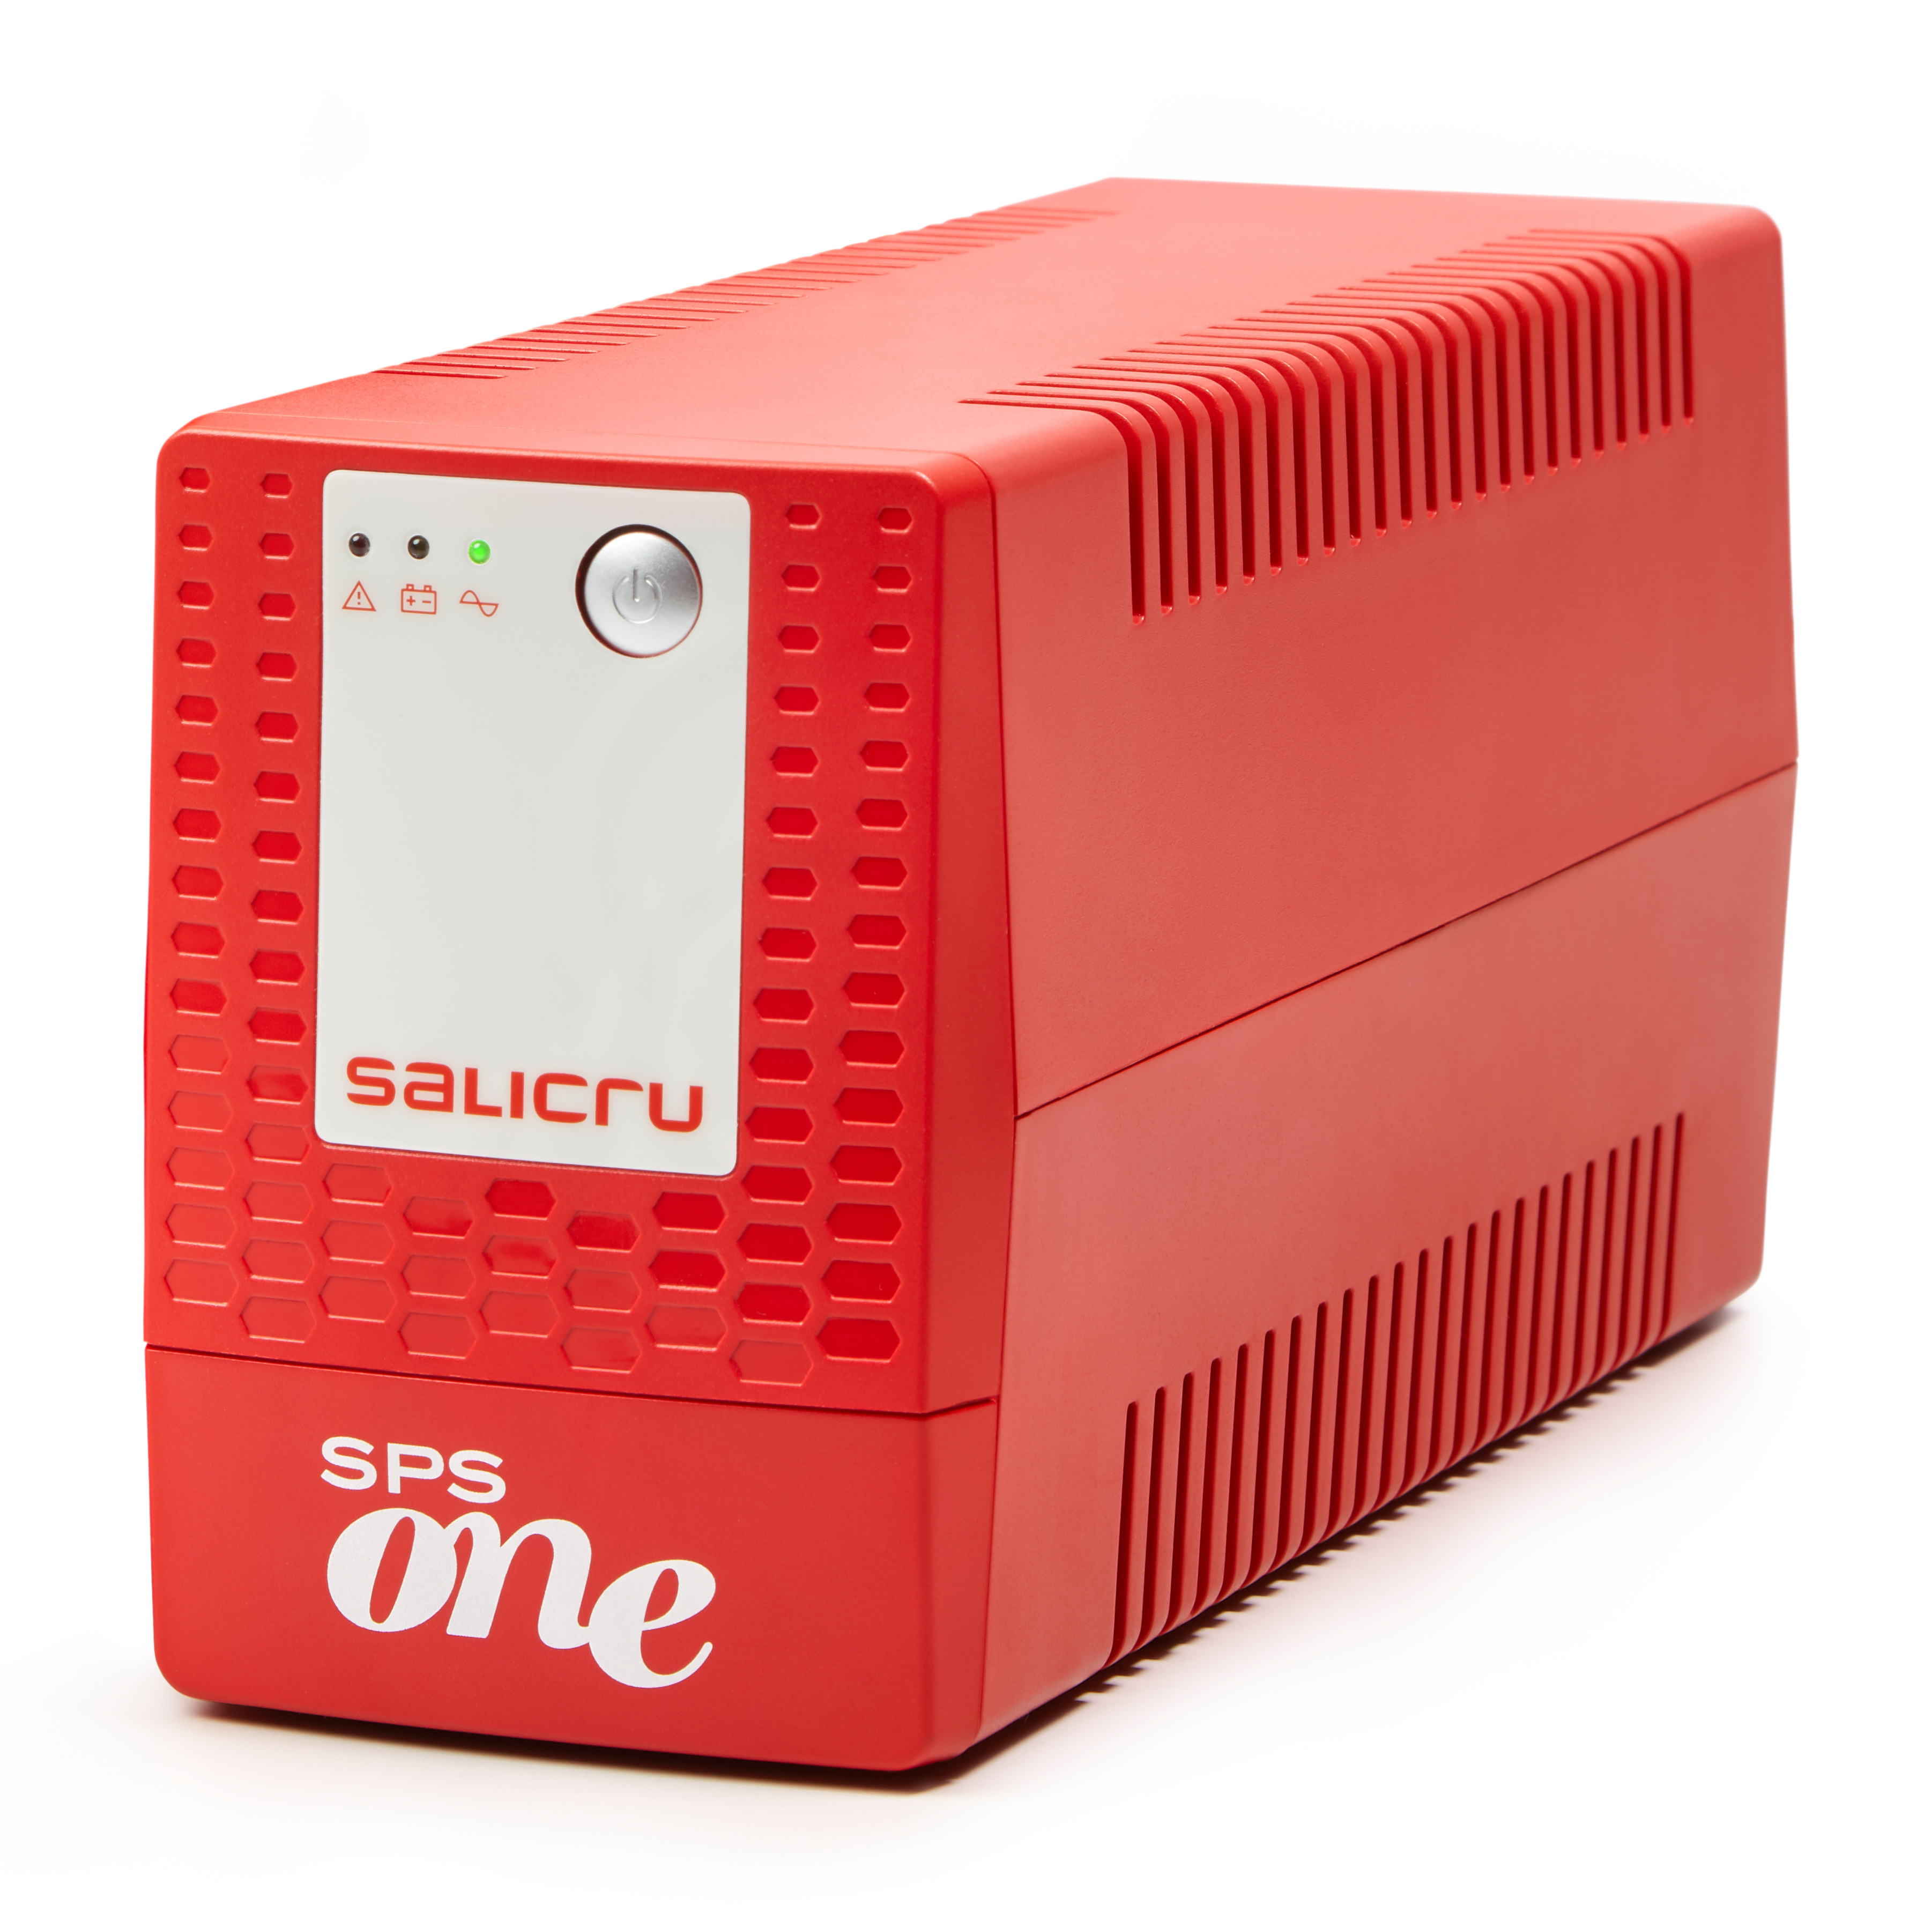 SALICRU SPS 700 ONE IEC - Line-Interaktiv - 700 VA - 360 W - Sine - 162 V - 290 V